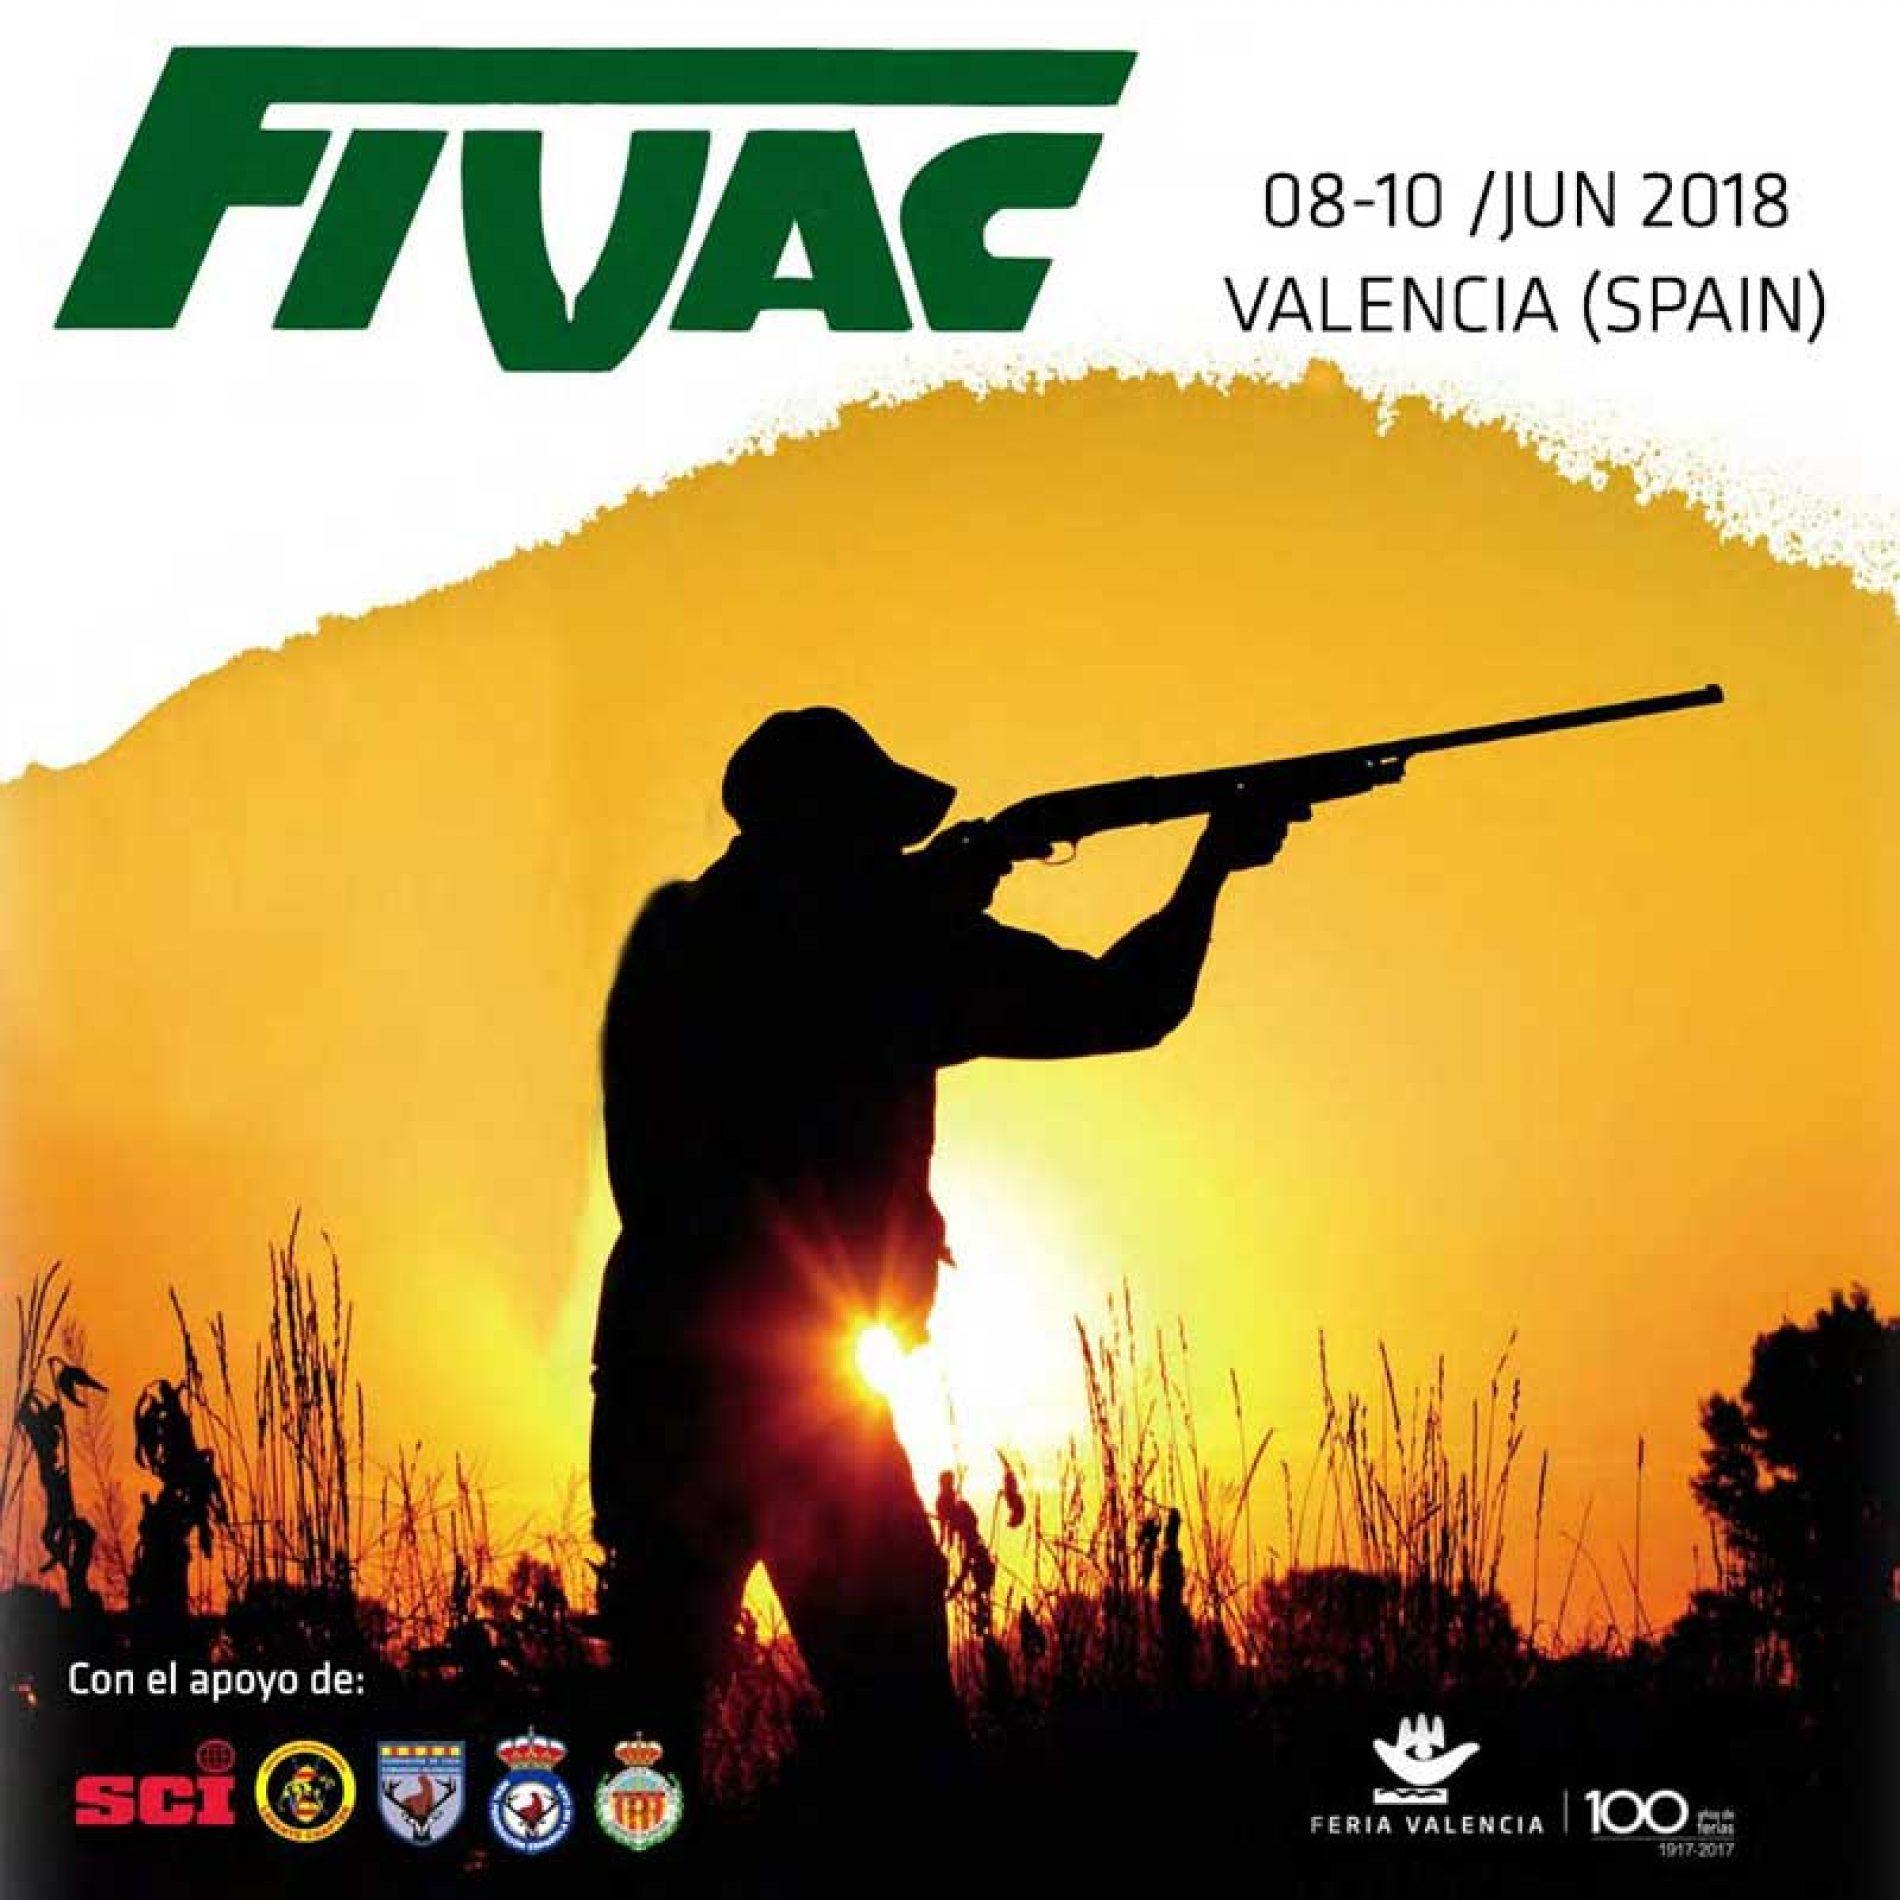 Feria de Valencia recupera su histórica feria de la caza FIVAC